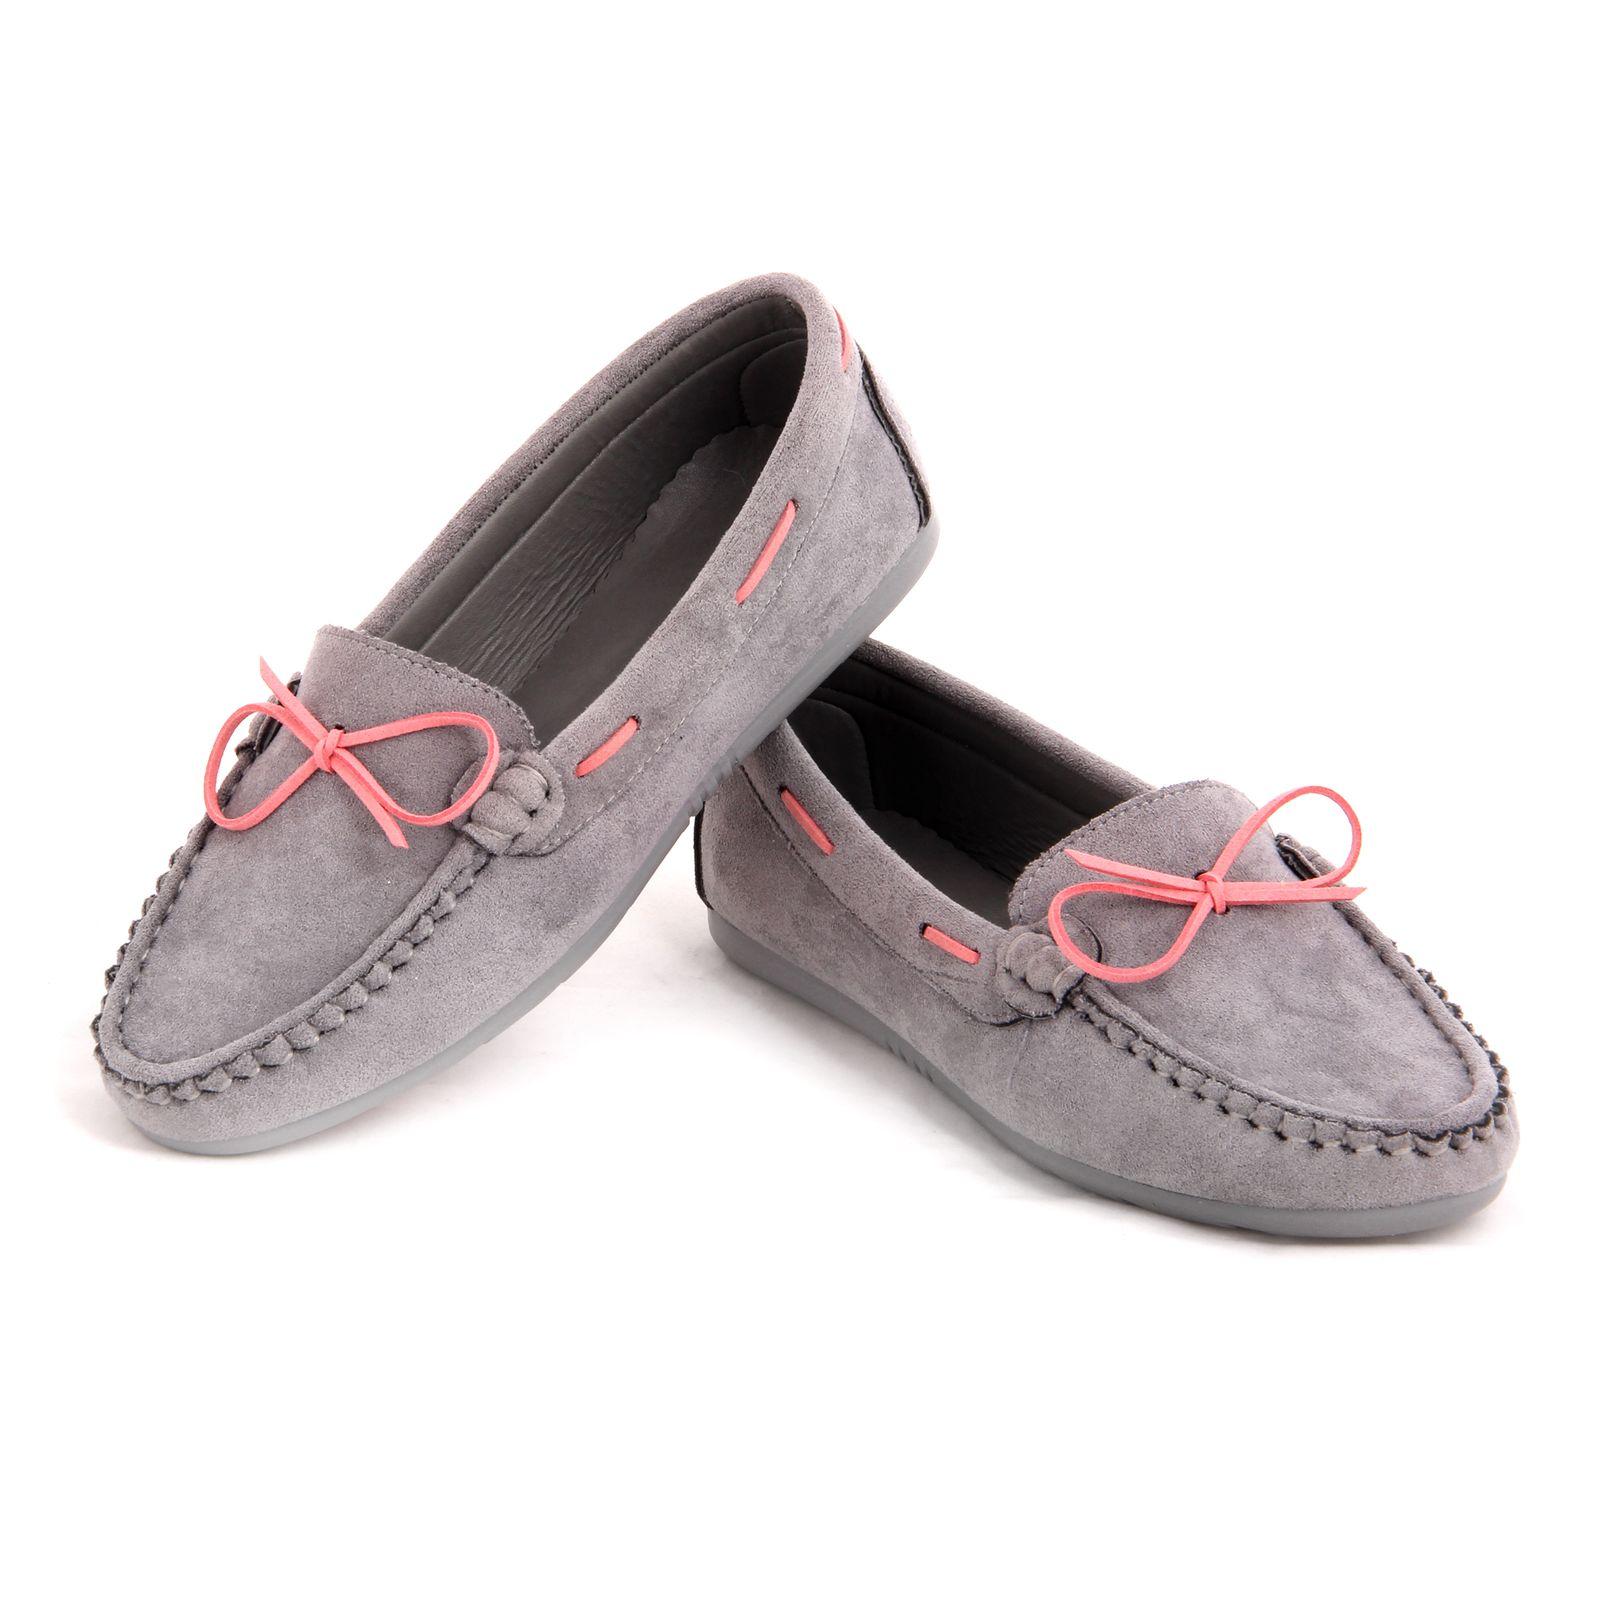 کفش روزمره زنانه کد 395 main 1 2